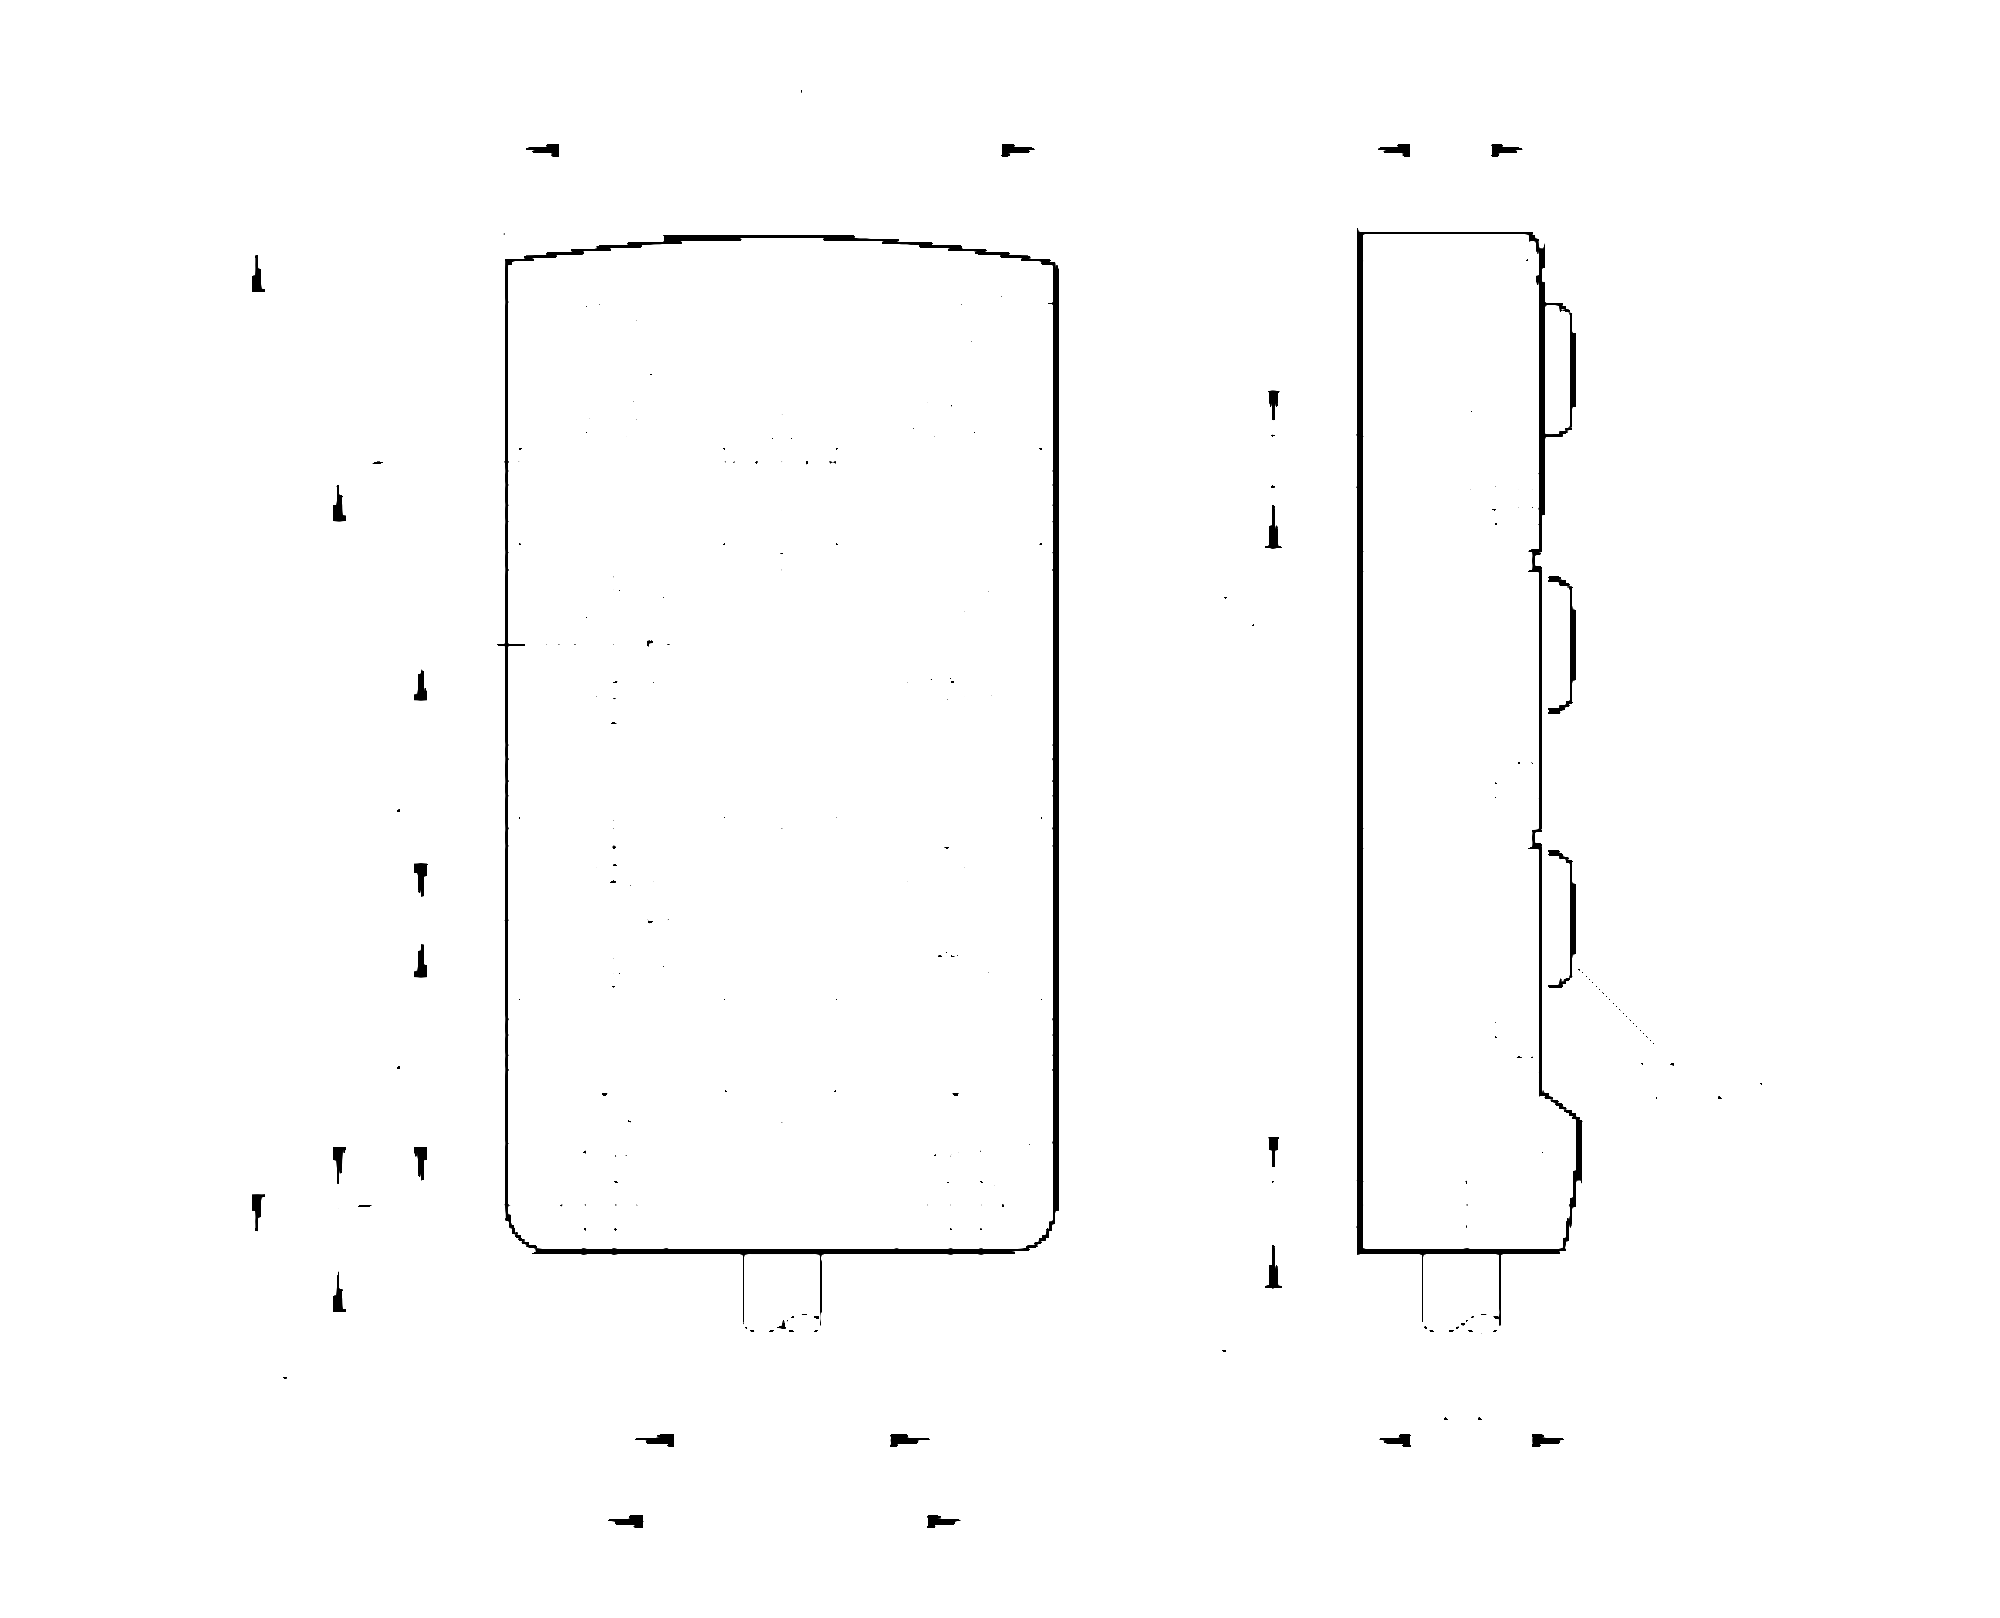 ebc018 - wiring block